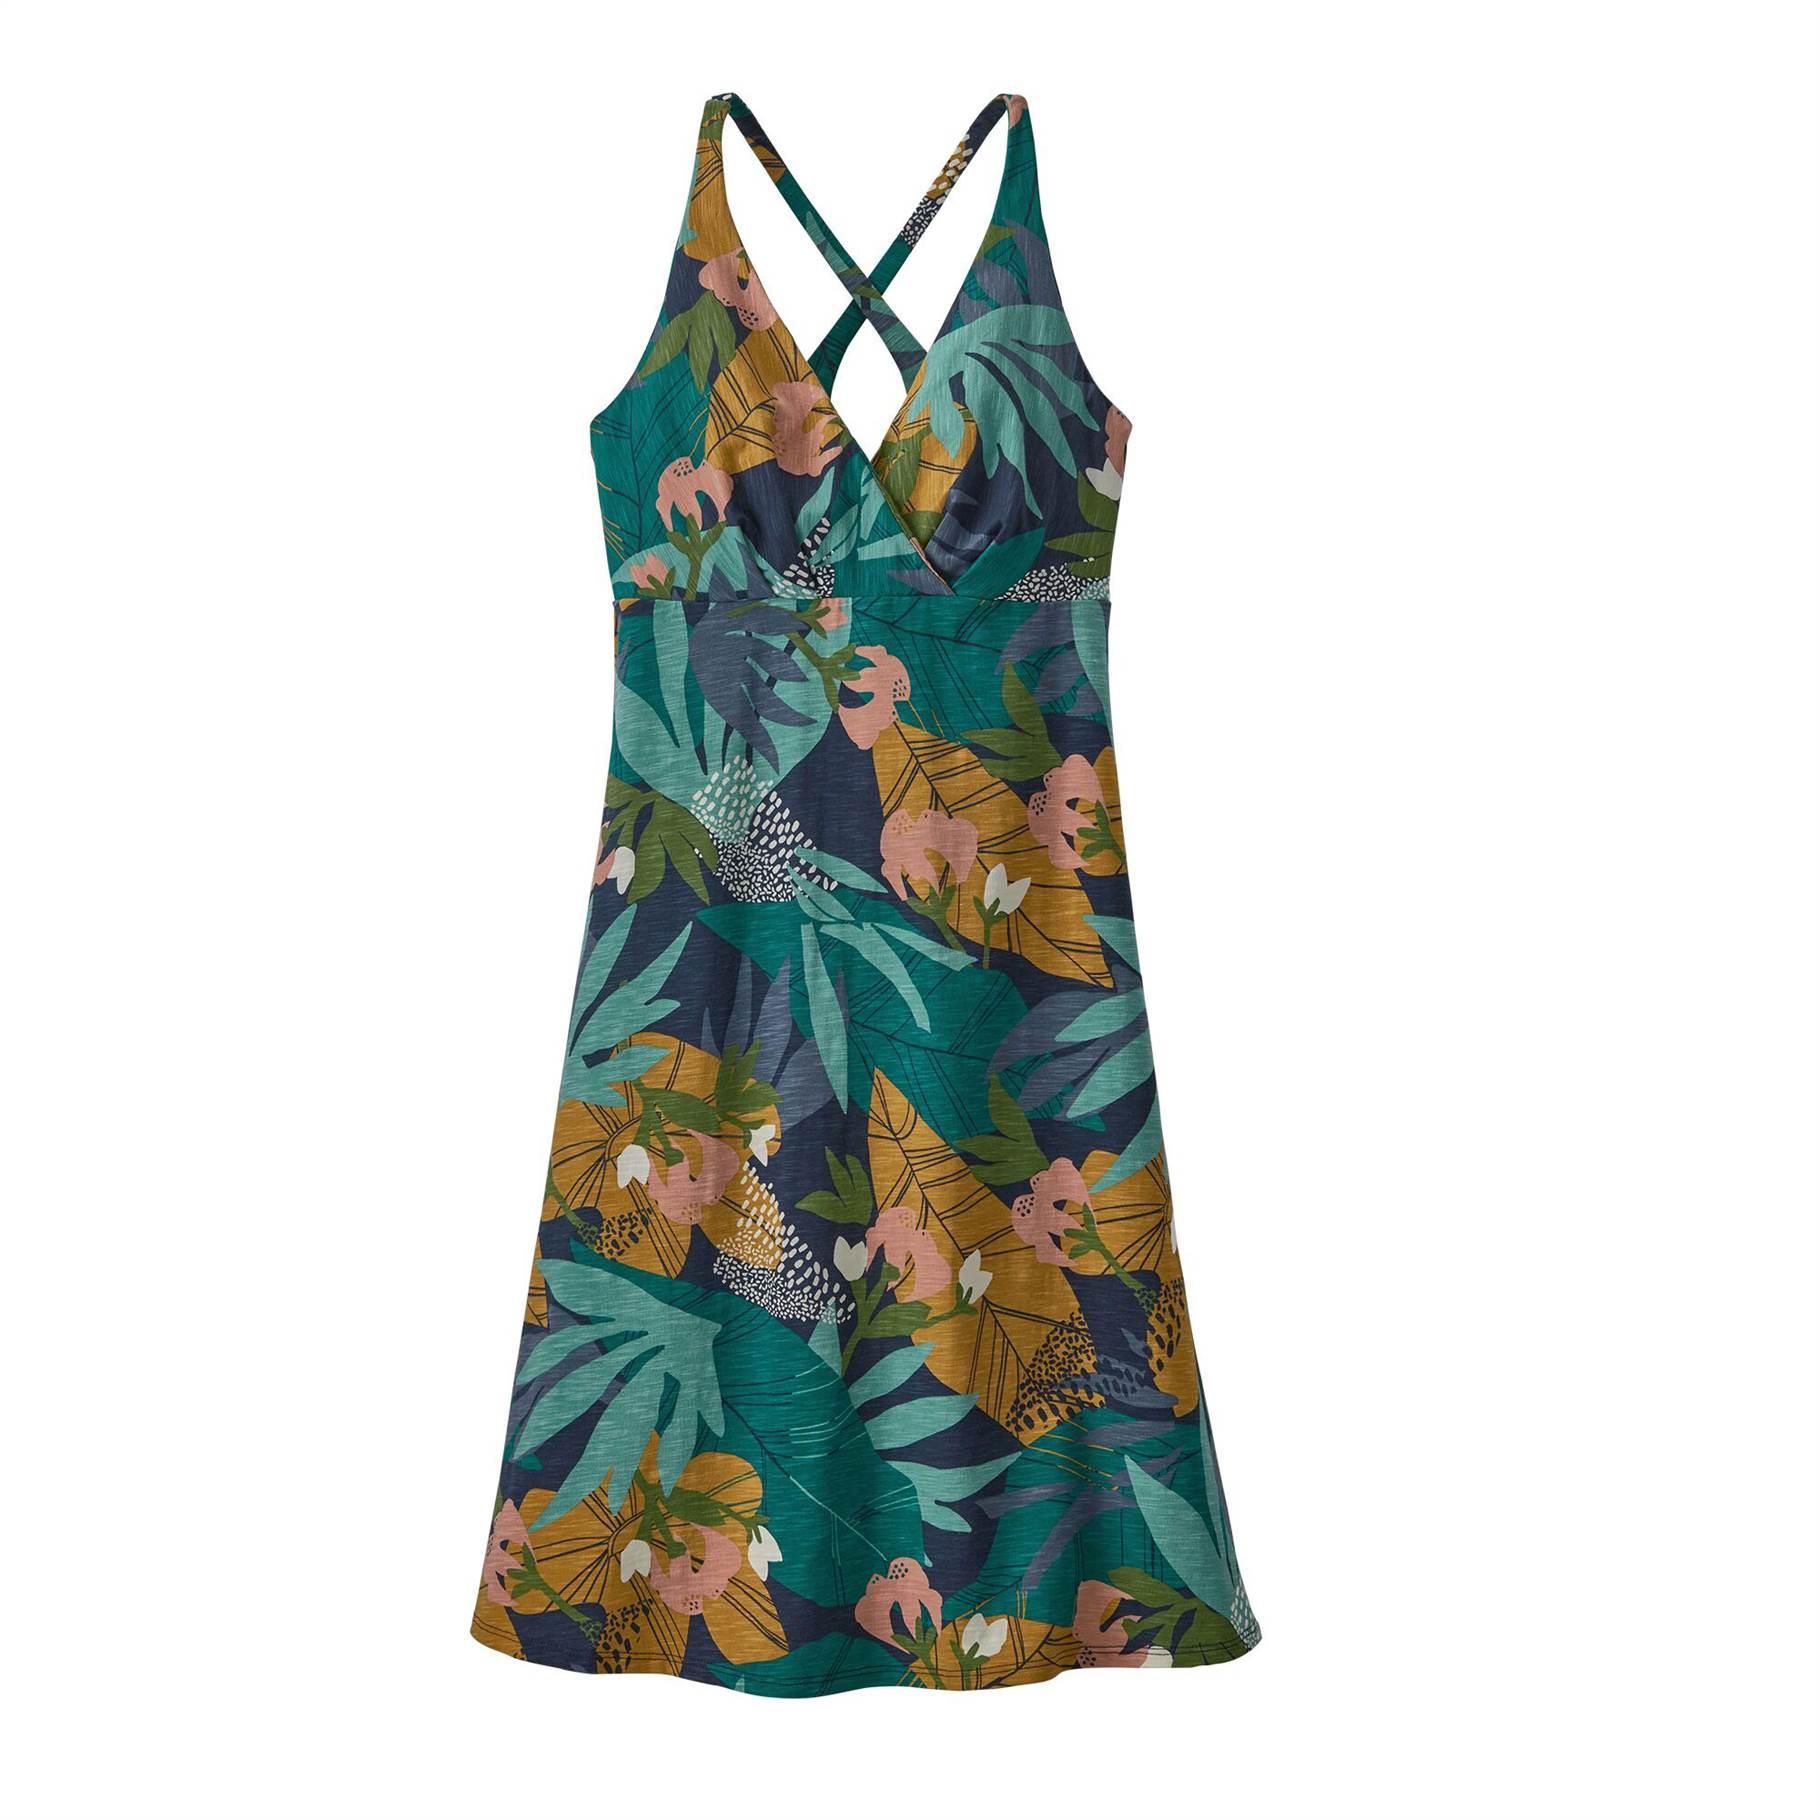 Amber Dawn Dress - Women's